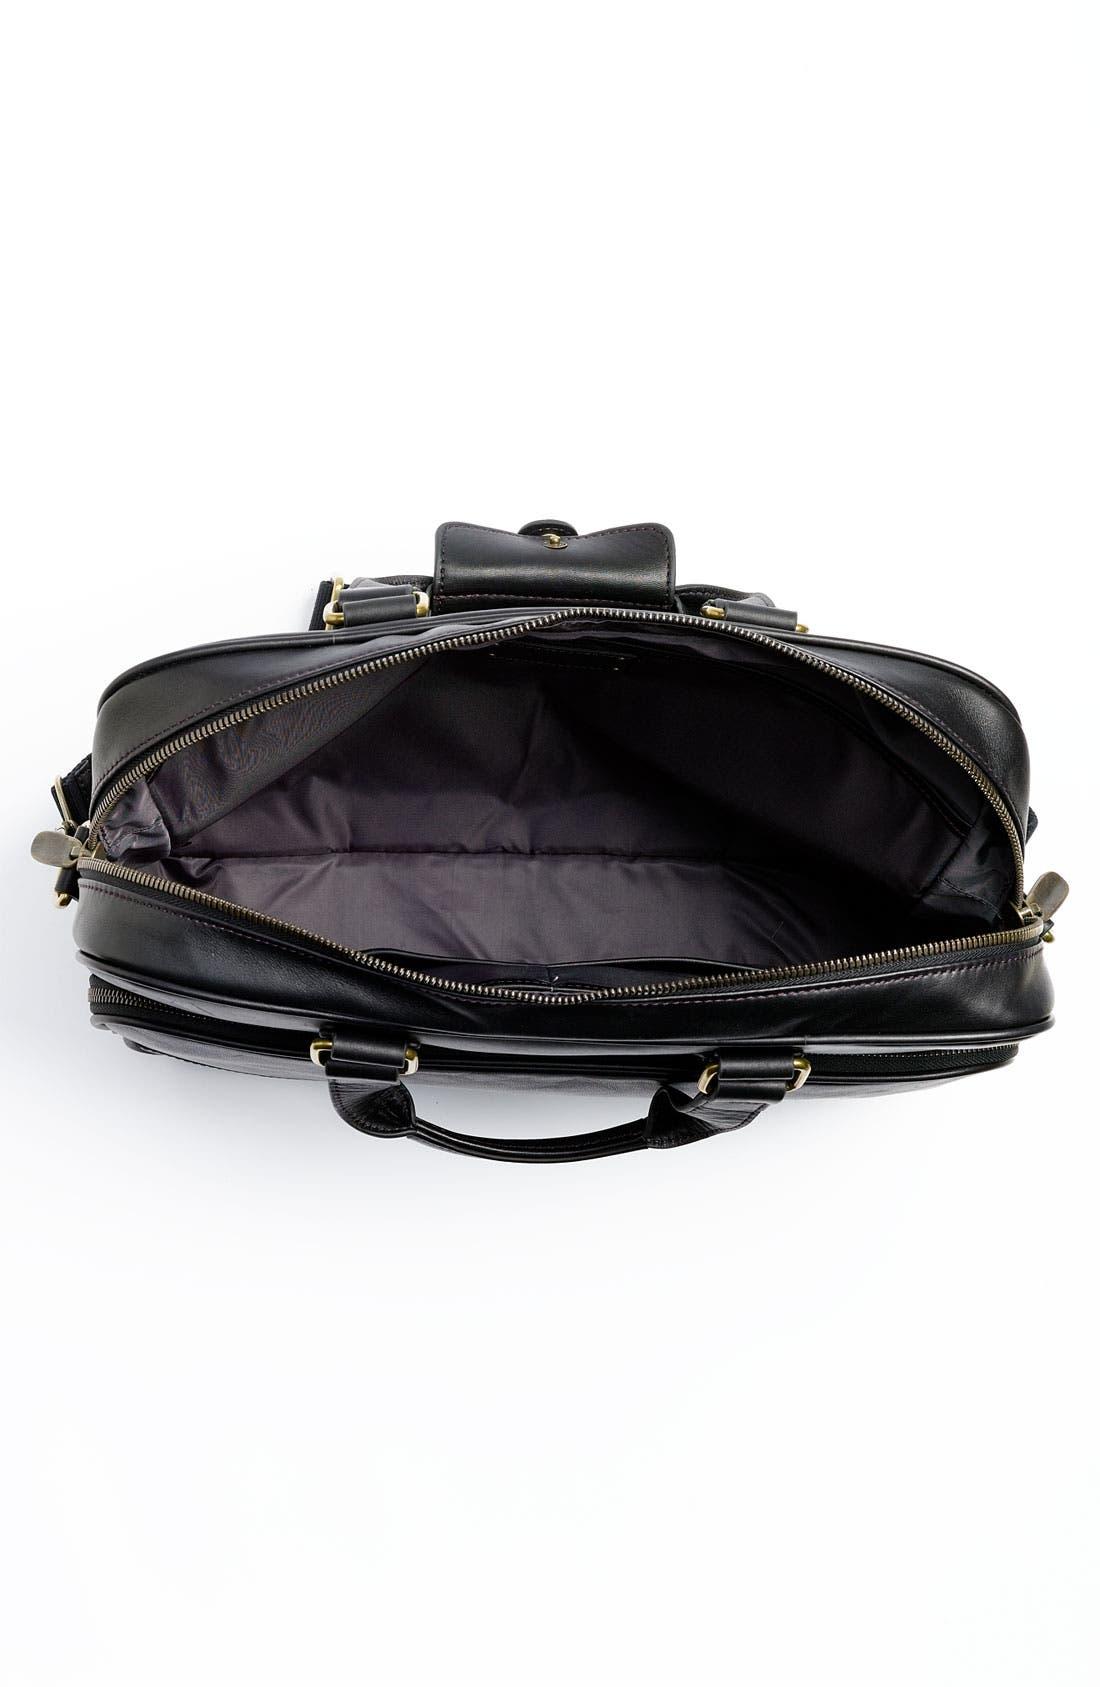 Top Zip Leather Briefcase,                             Alternate thumbnail 3, color,                             Black